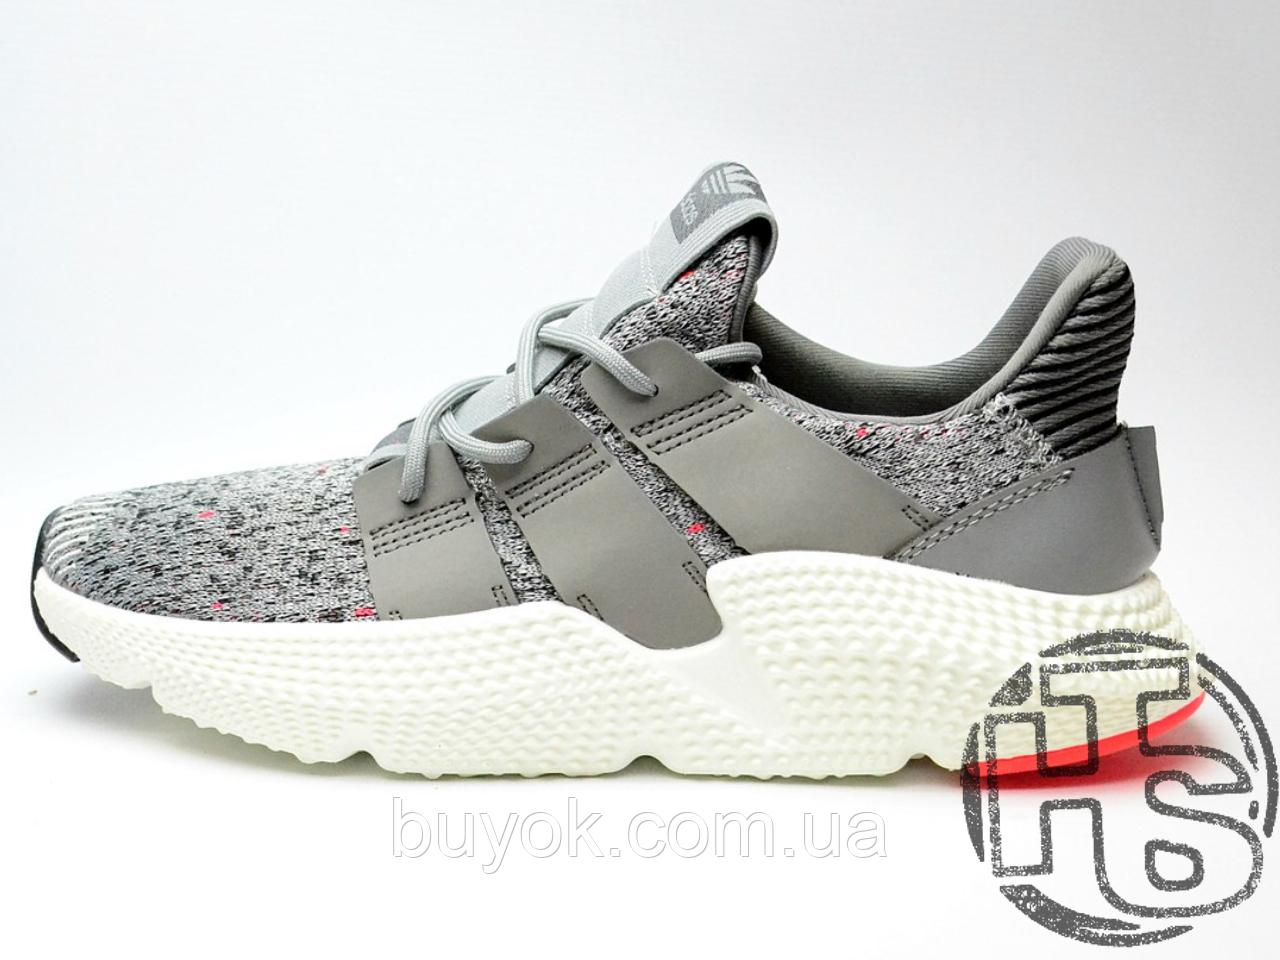 Мужские кроссовки Adidas Prophere Refill Pack Grey/White CQ3023